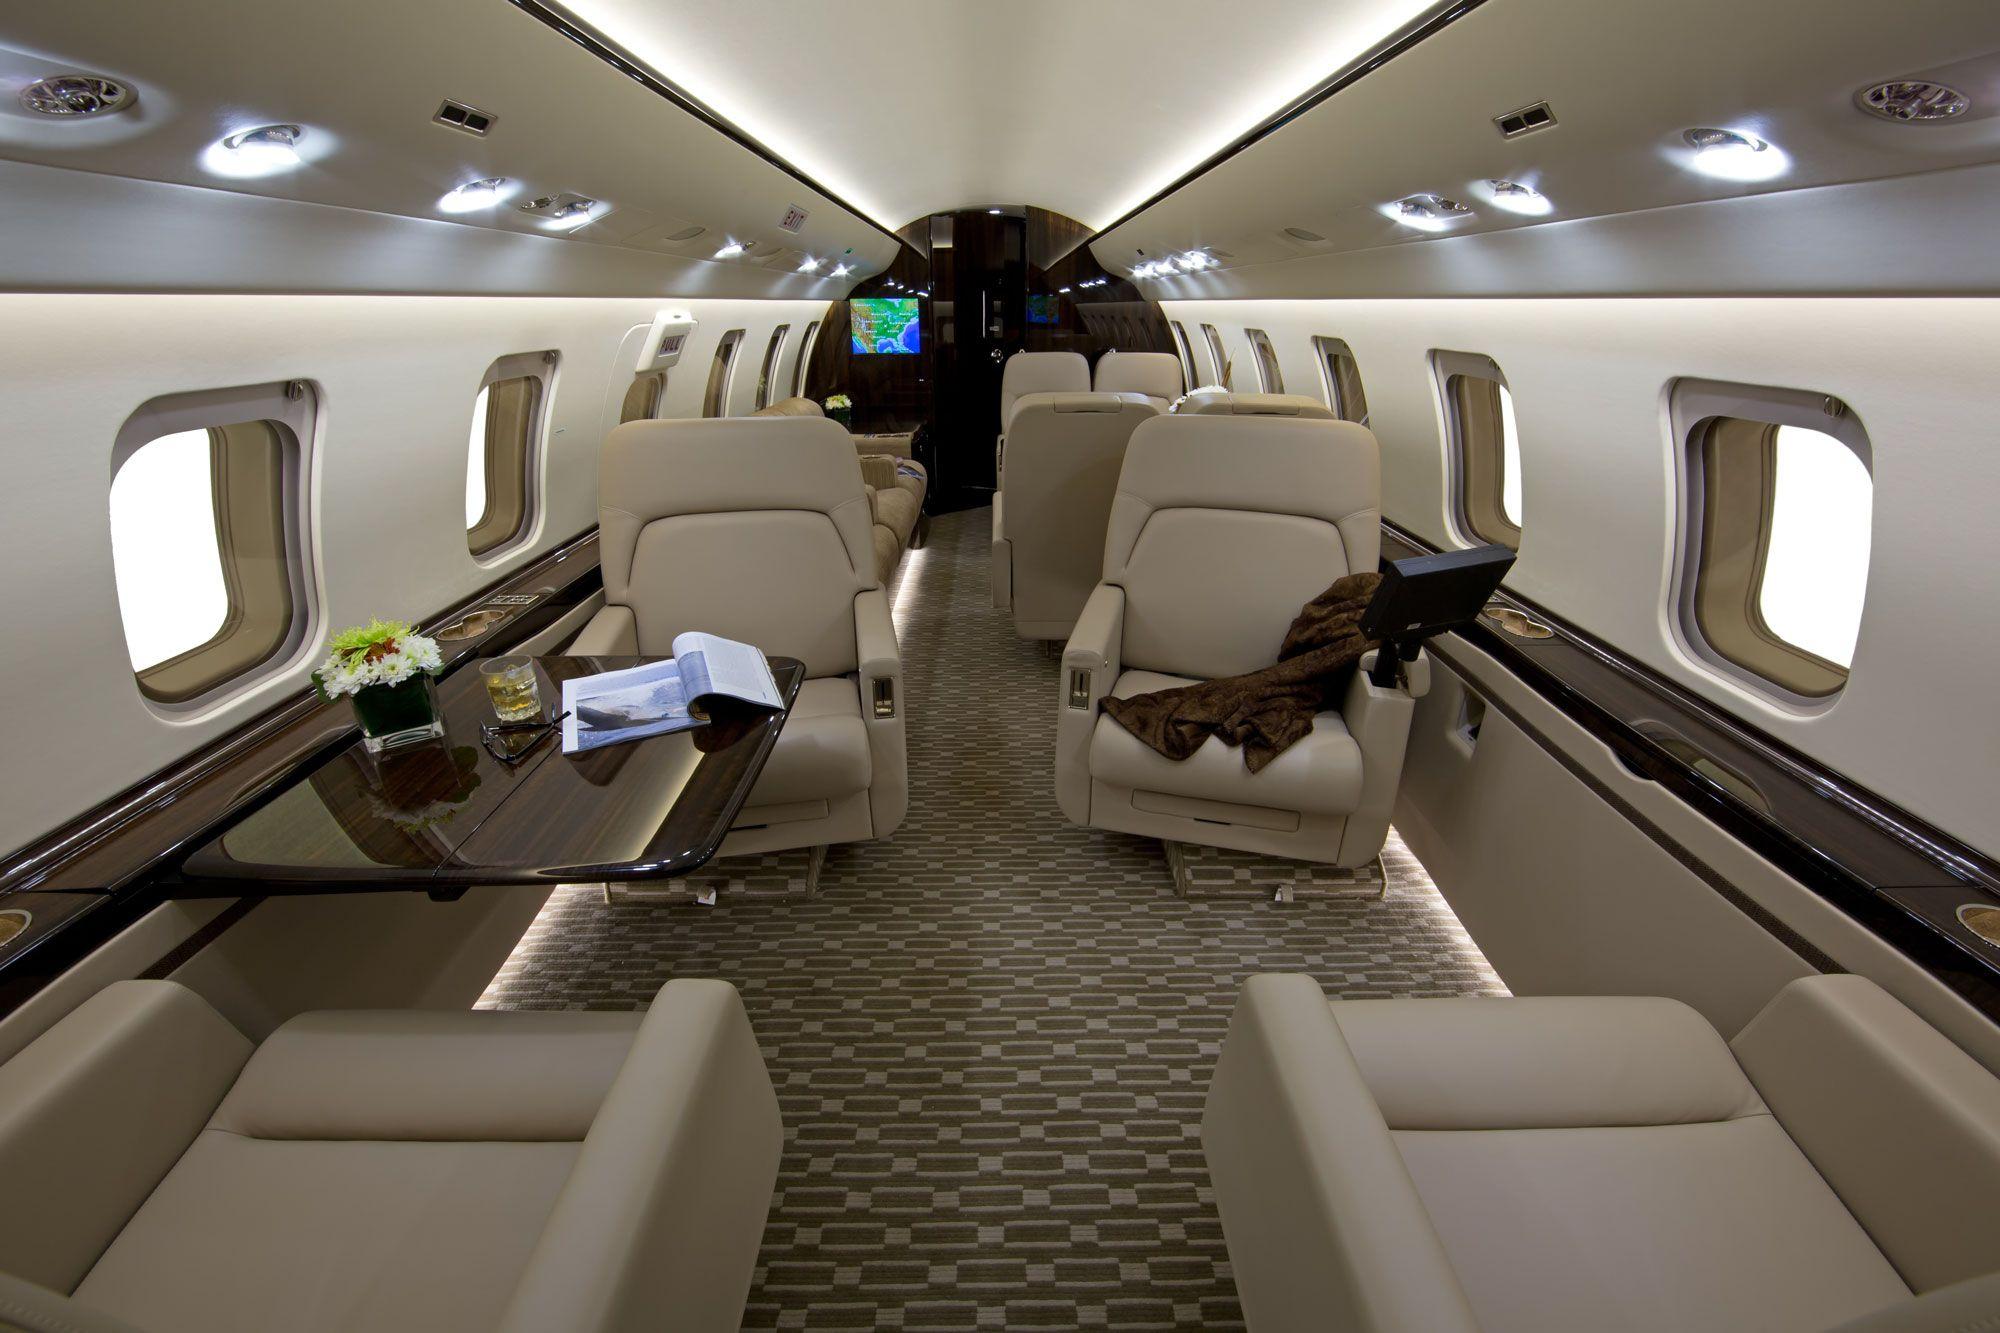 #bombardier #challenger605 #lasvegasjets #jetcharter #privateaviation #bizav Call 702-606-4296 to reserve!